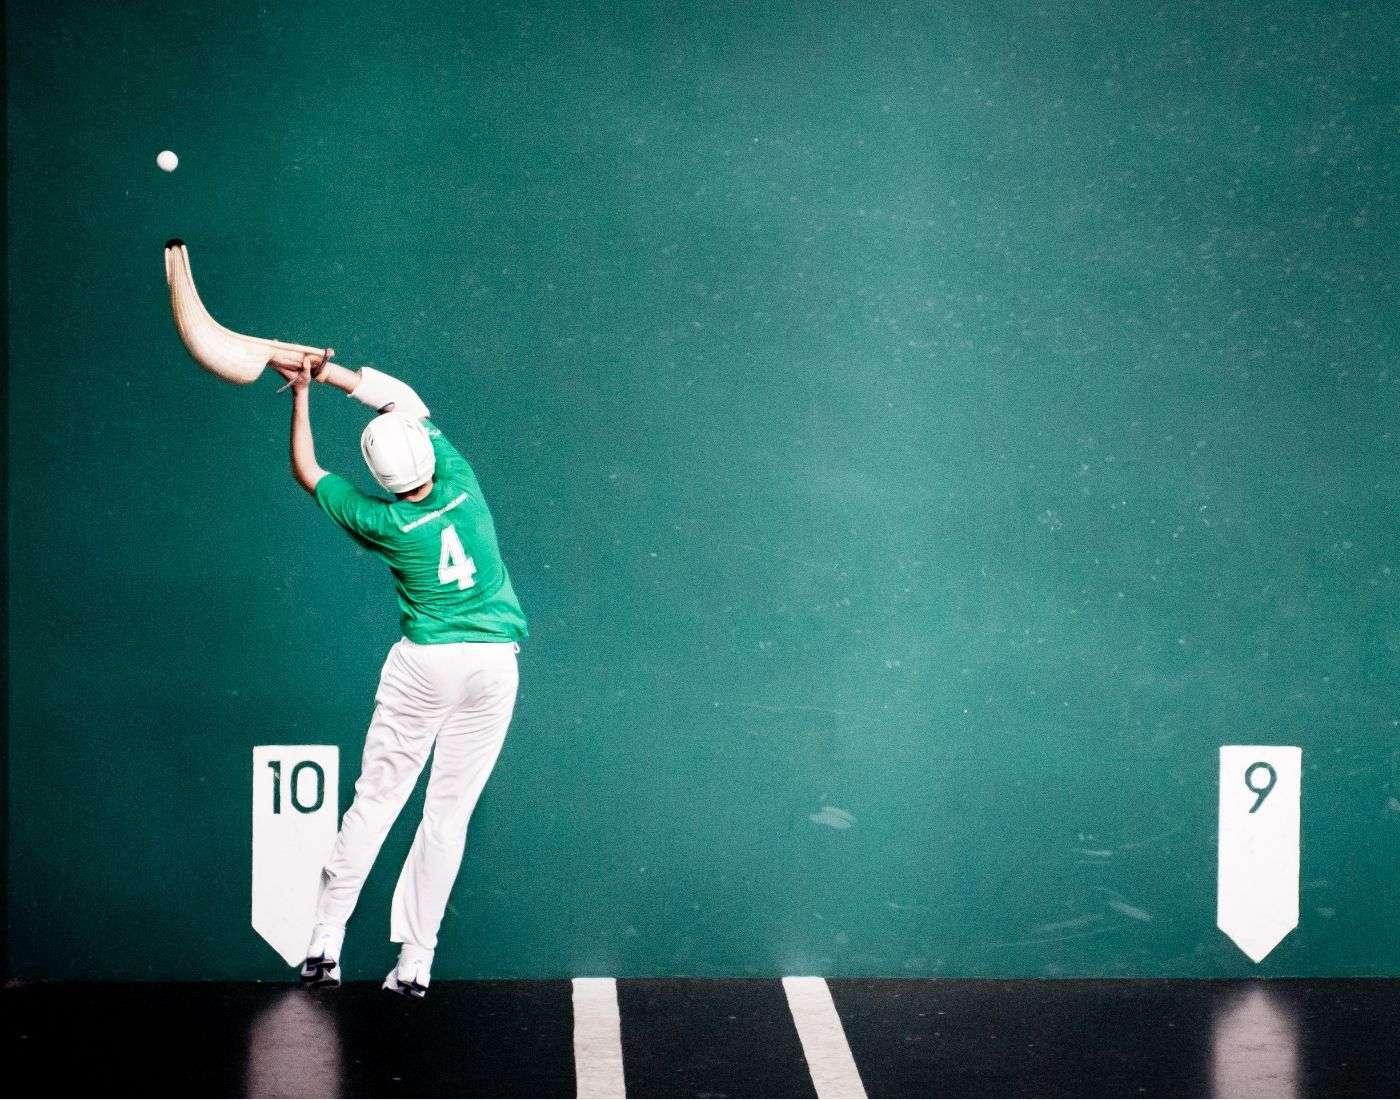 basque racket game